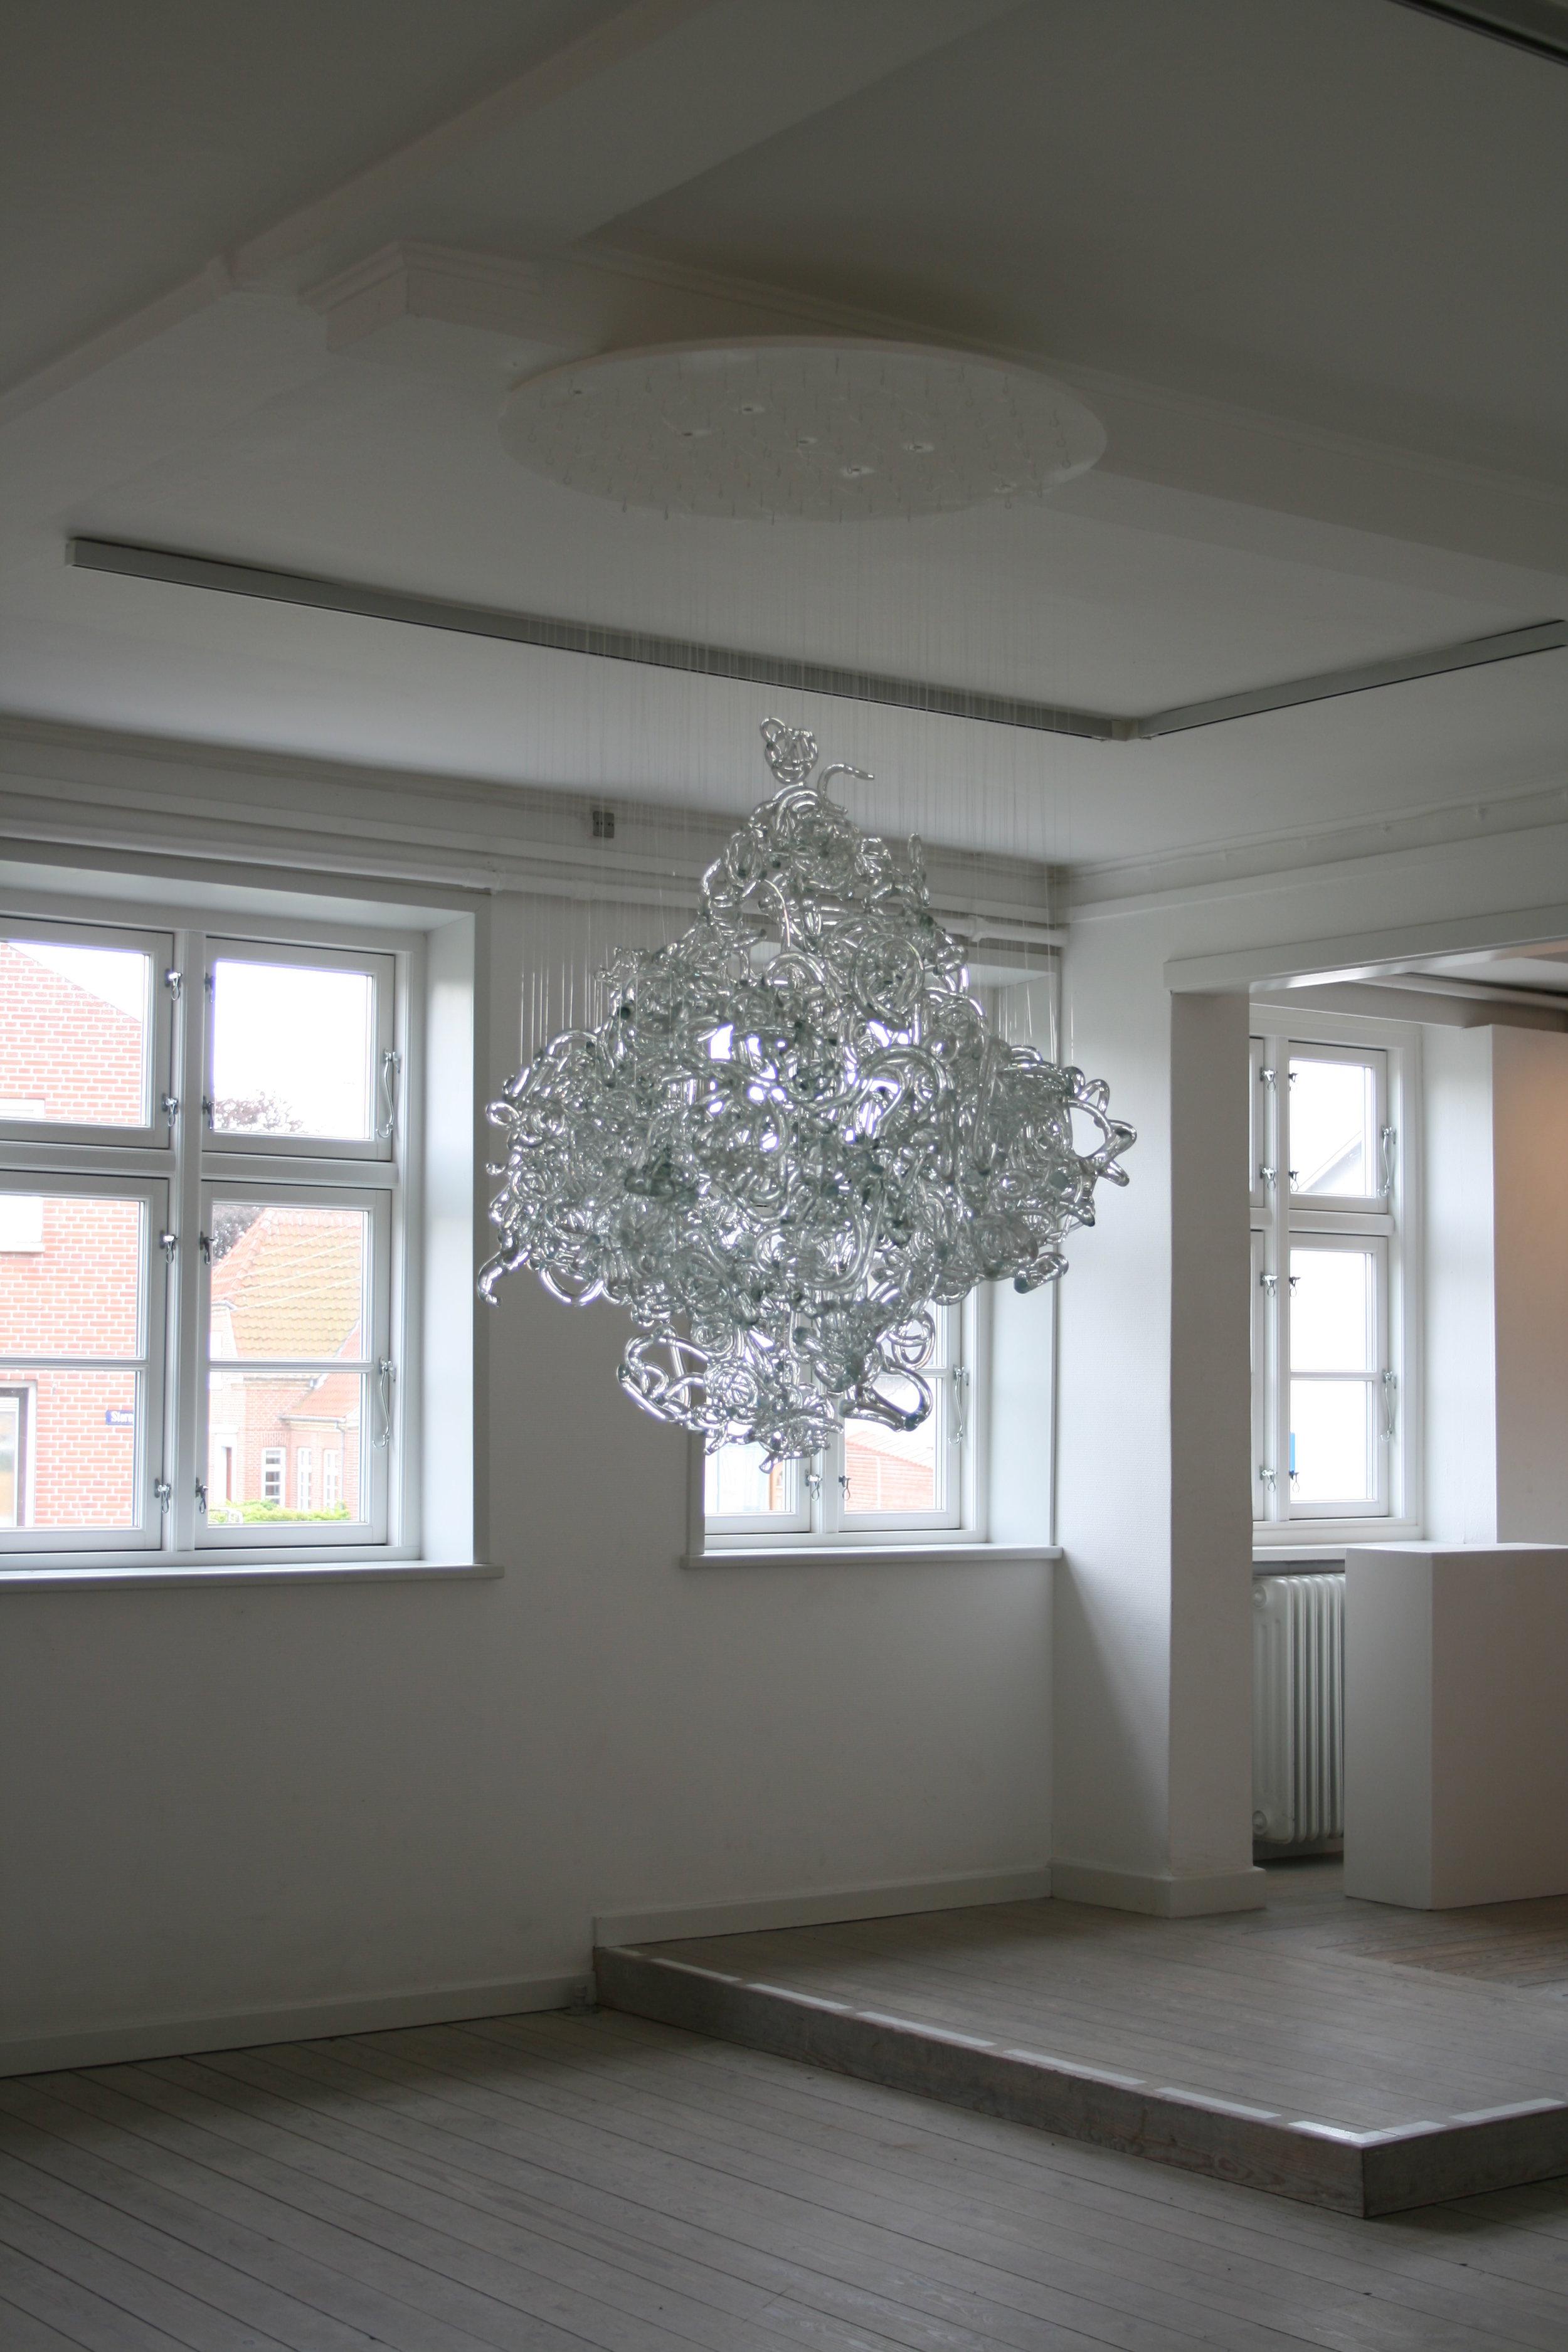 Light Entanglements, 2009